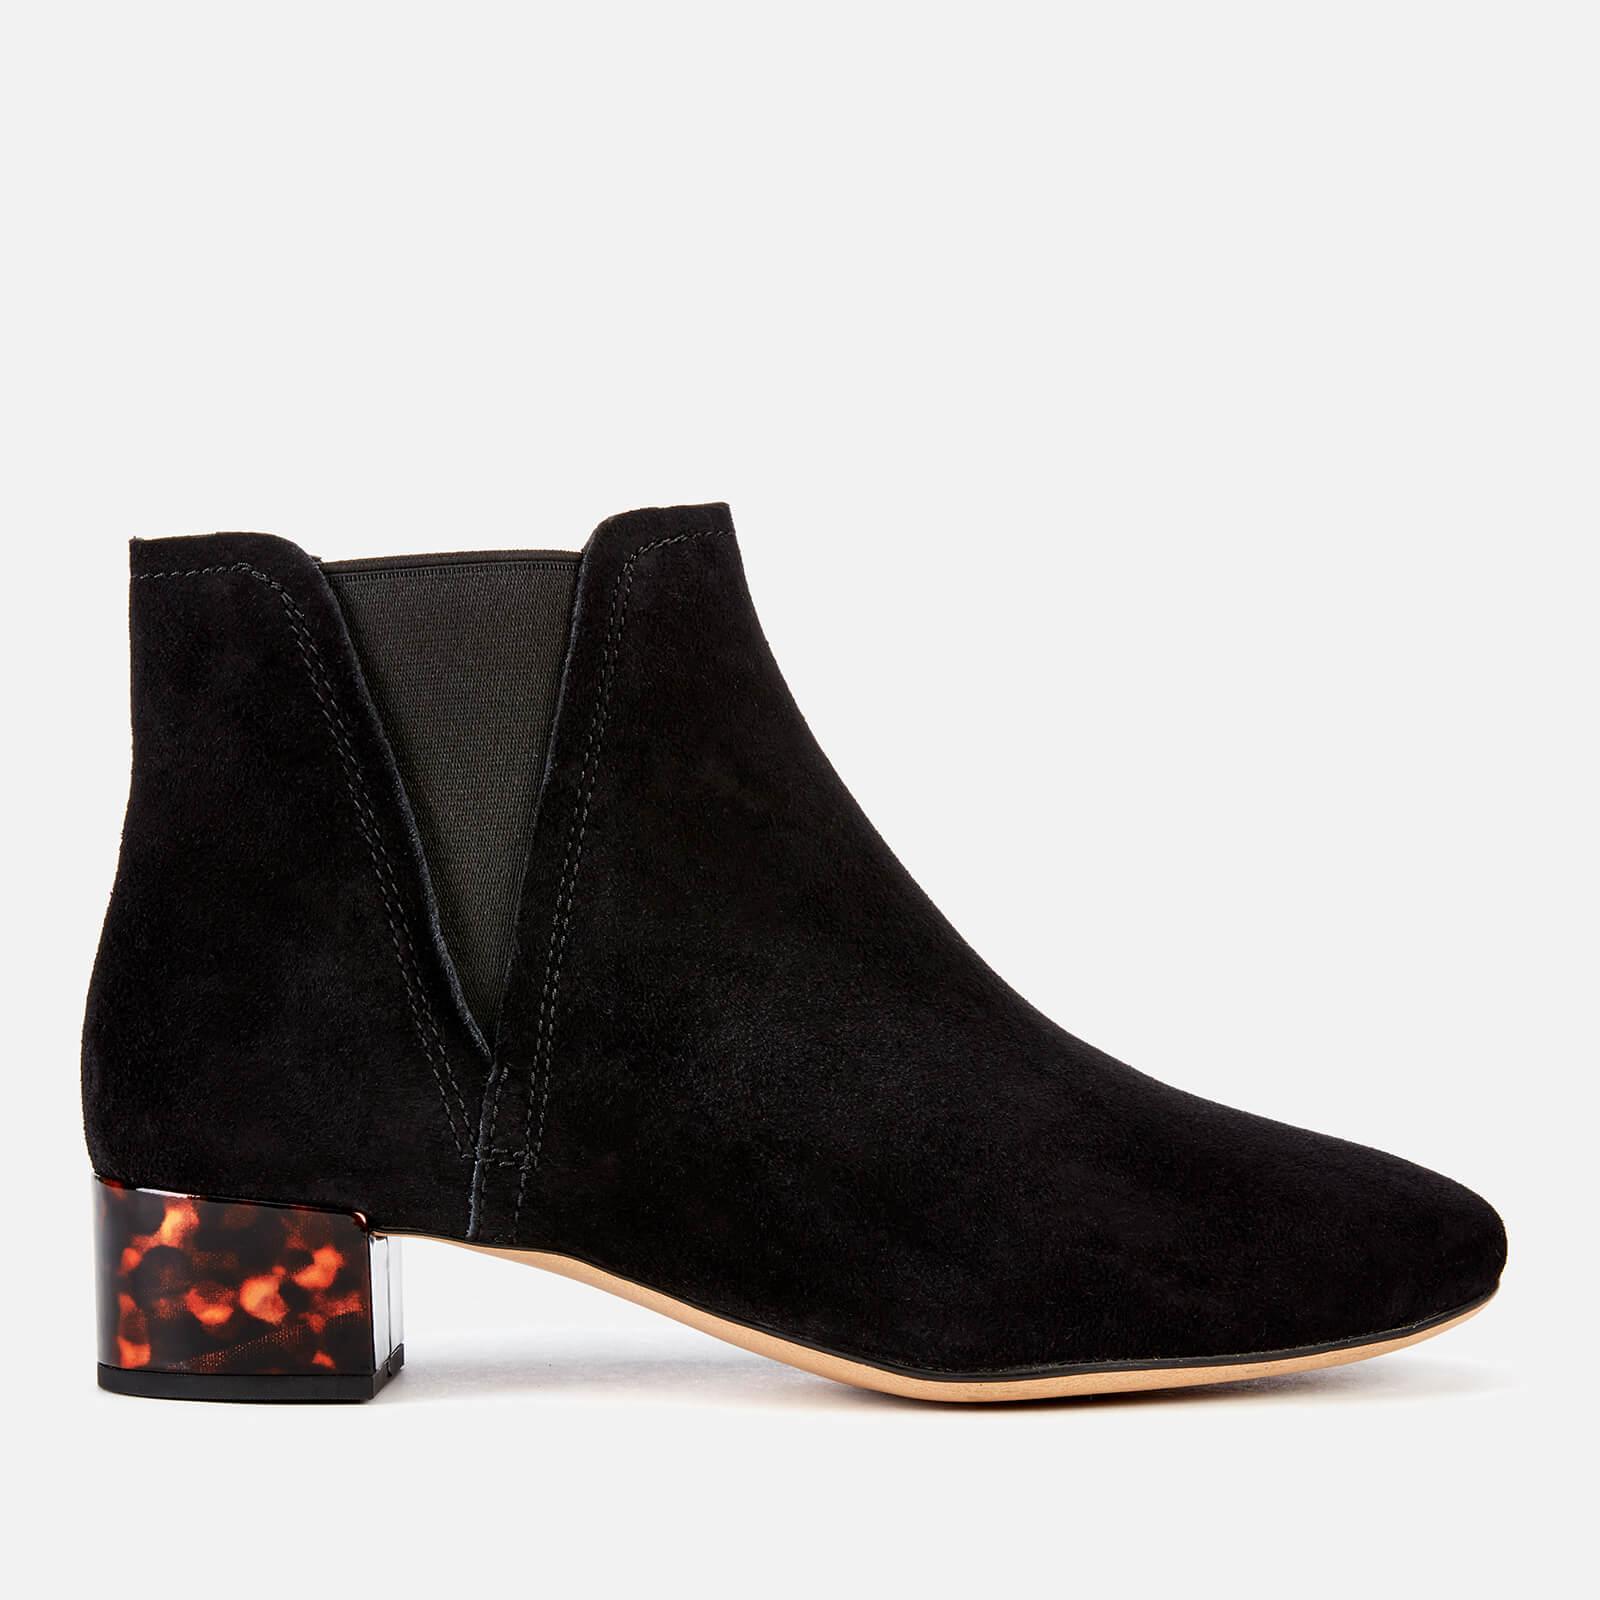 Clarks Women's Orabella Ruby Suede Heeled Ankle Boots - Black - UK 6 - Black